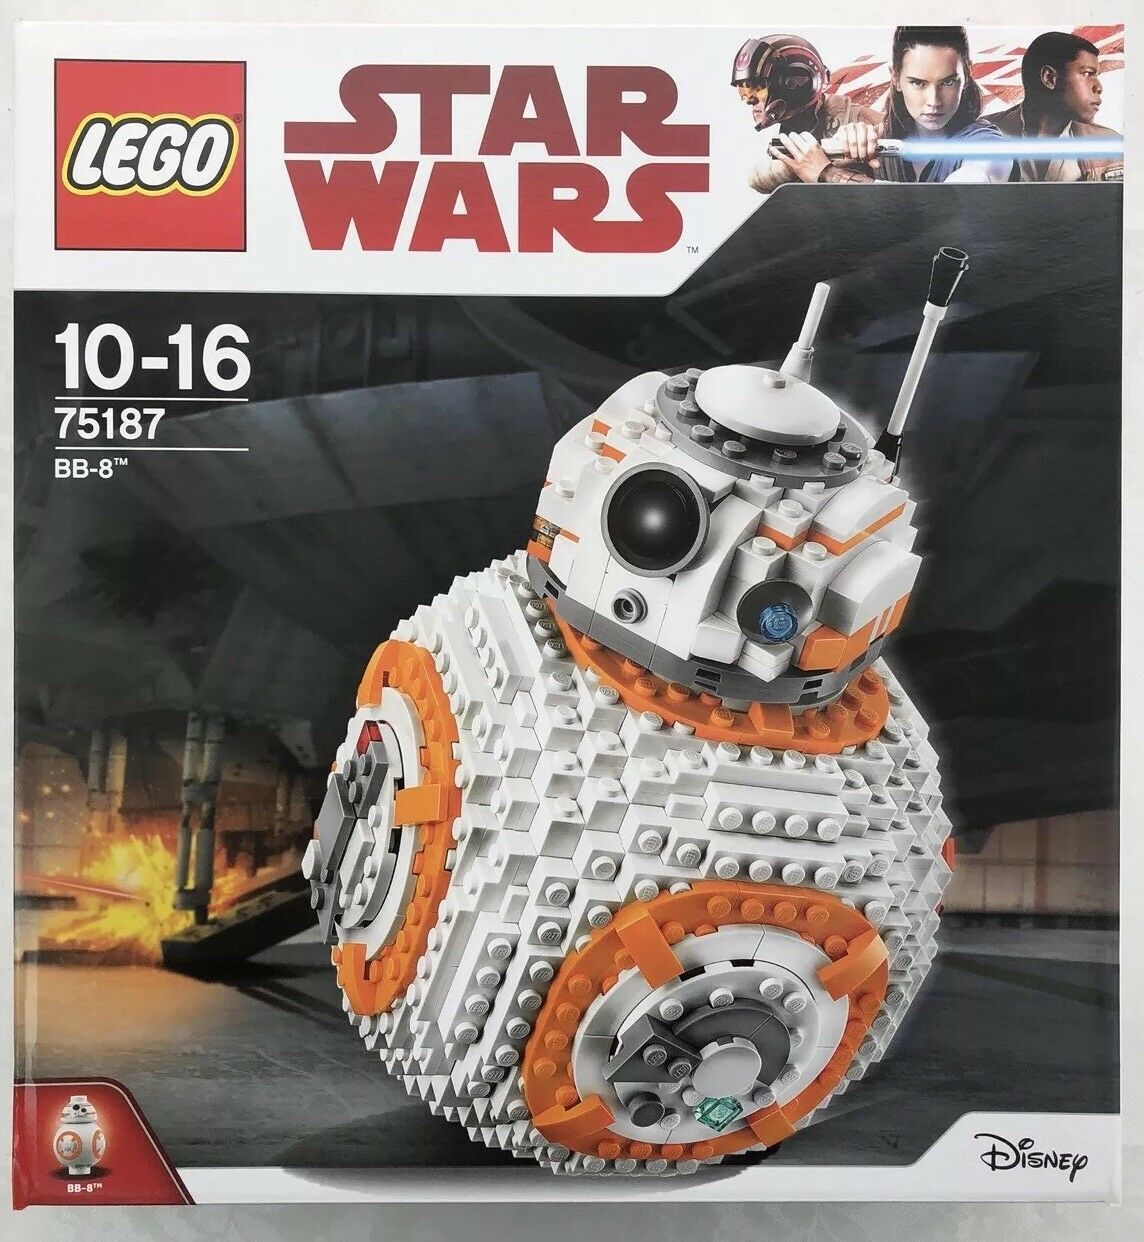 LEGO Star Wars - BB-8 (75187) - Brand NEW & SEALED